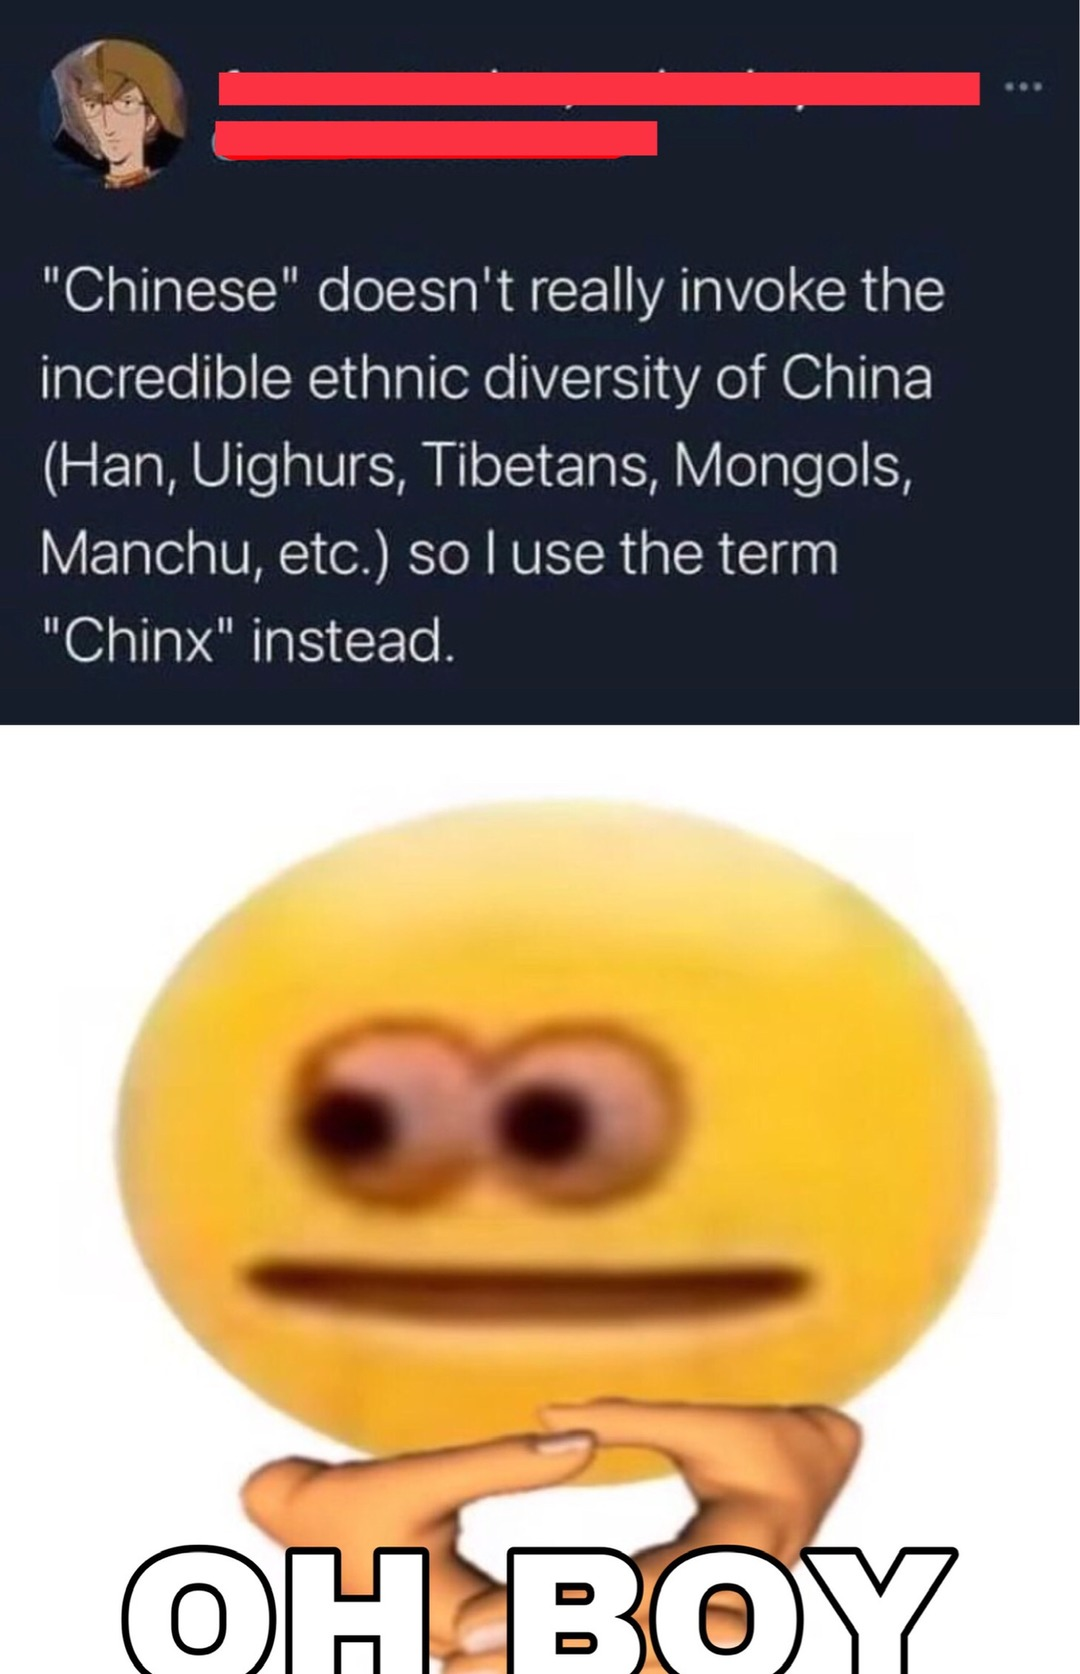 ah shit, here we ho again - meme